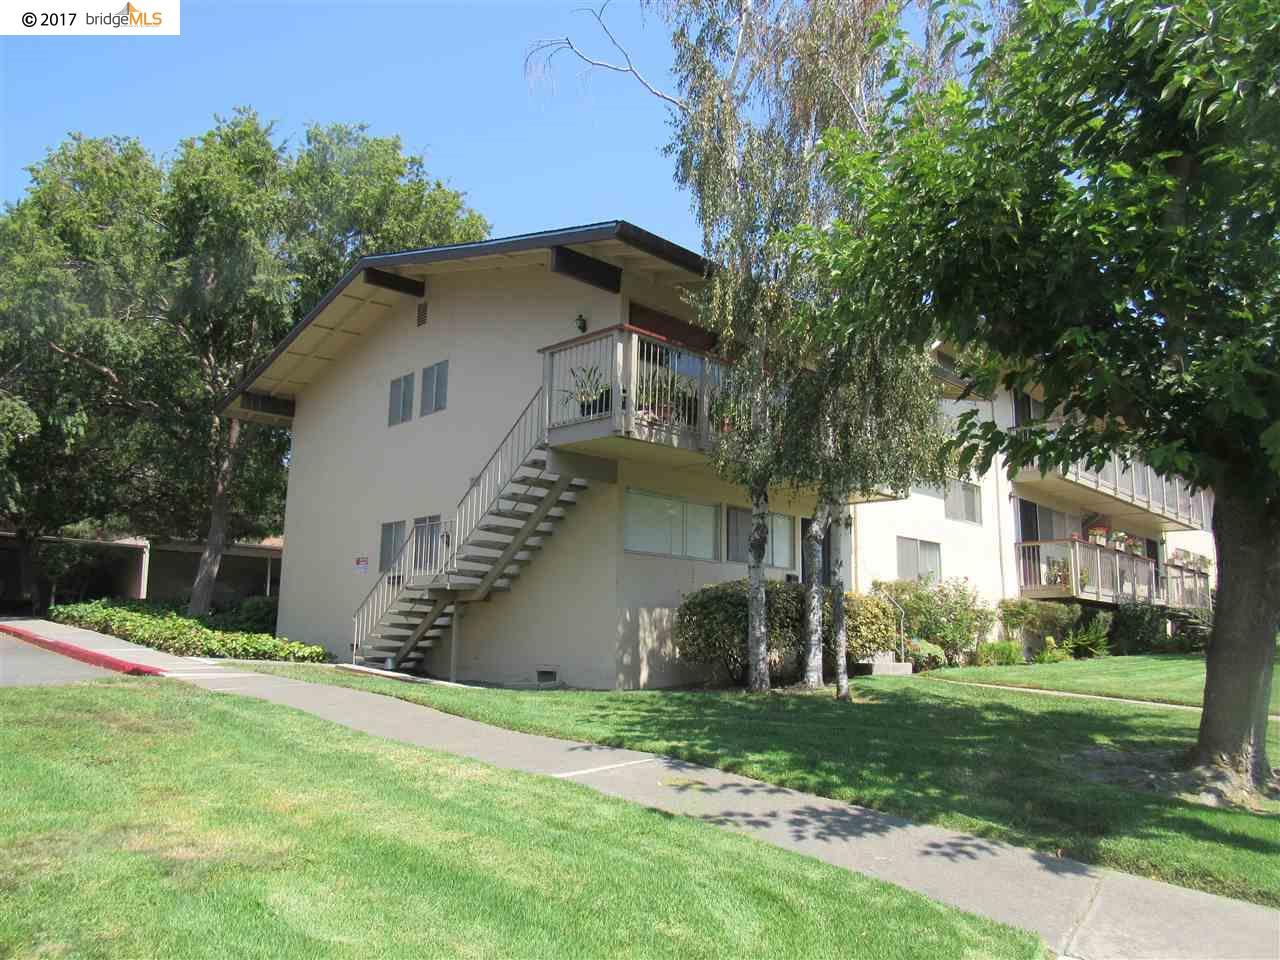 شقة بعمارة للـ Sale في 2351 Paloma Court 2351 Paloma Court Pinole, California 94564 United States